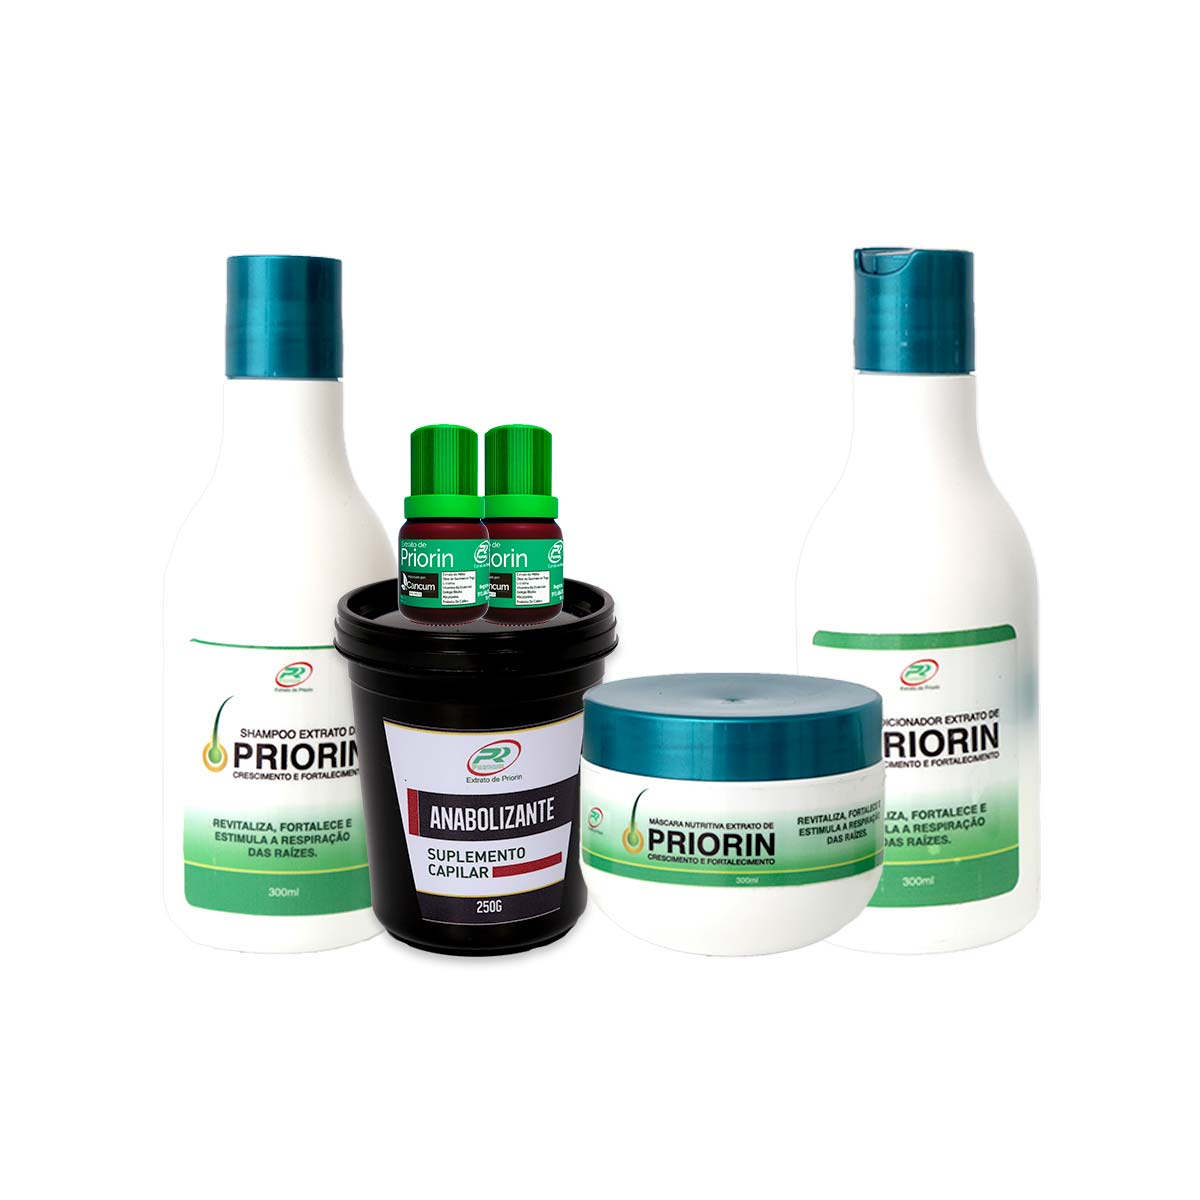 2 Tônicos Capilares (cresce cabelo) + Shampoo + Condicionador + Máscara + Anabolizante 250g